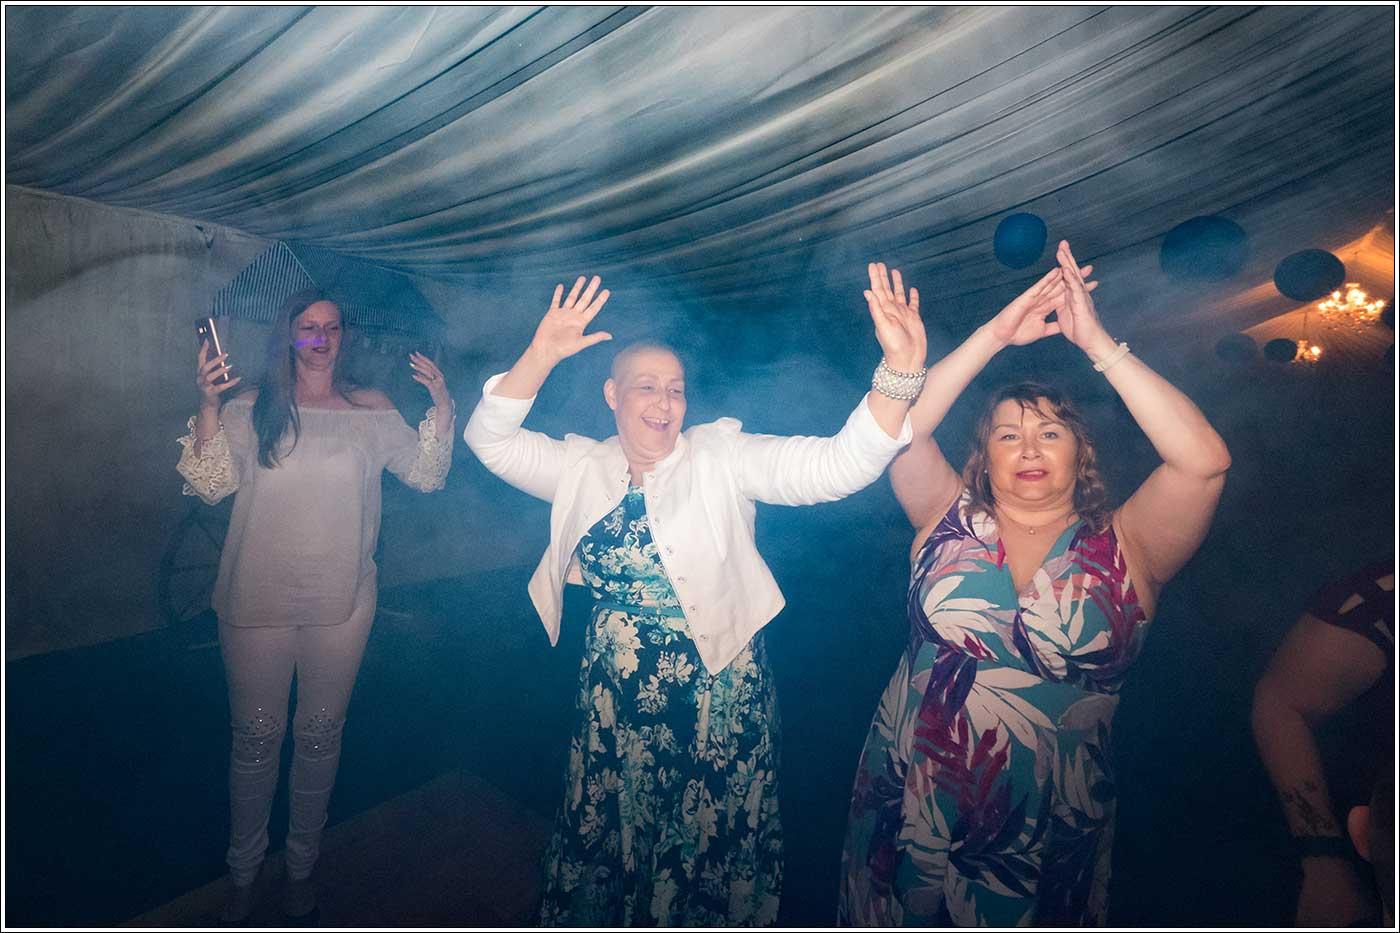 Women dancing during a Park Hall Farm wedding celebration